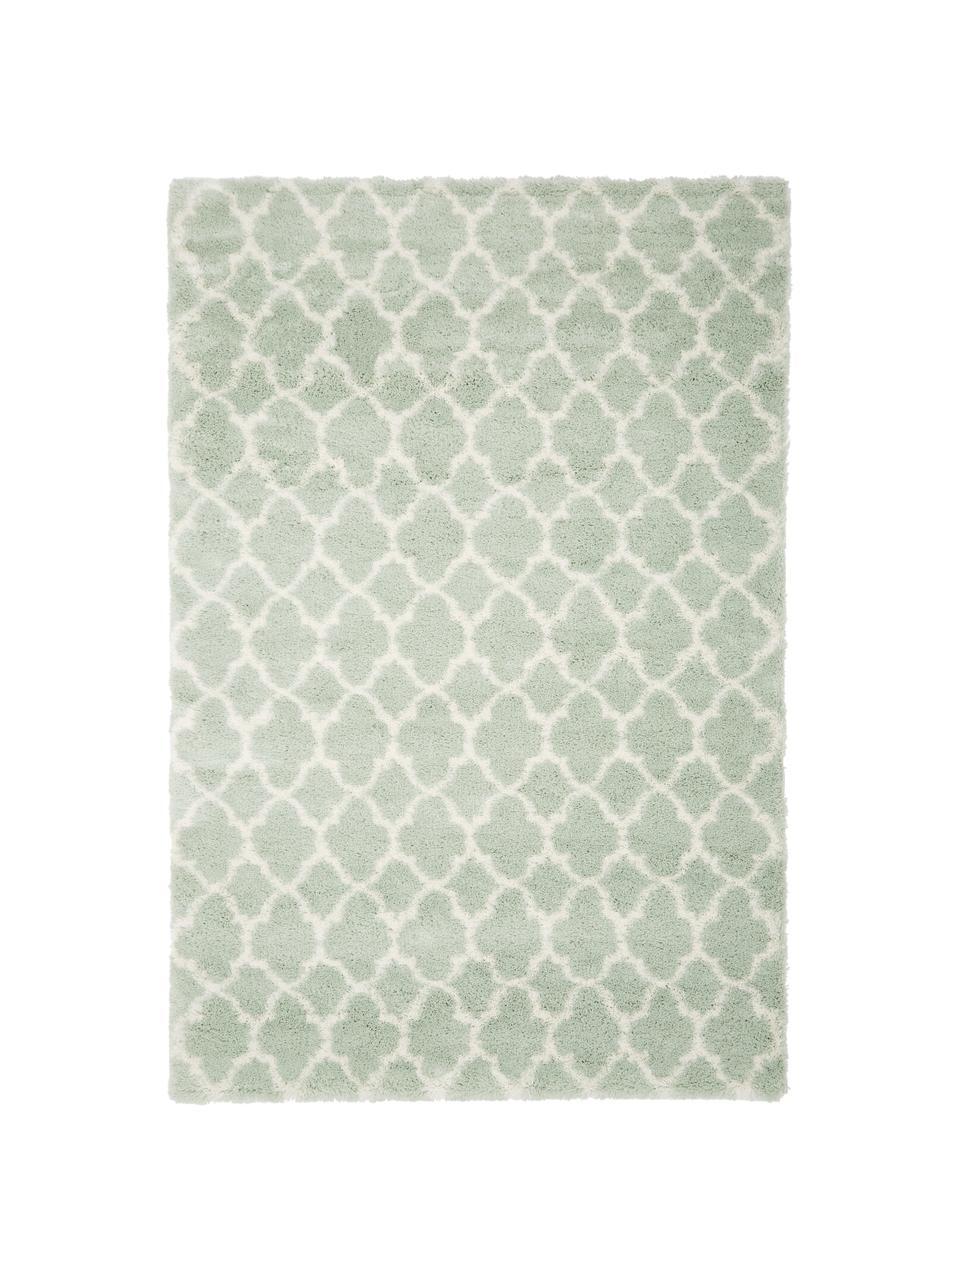 Hochflor-Teppich Mona in Mintgrün/Creme, Flor: 100% Polypropylen, Mintgrün, Cremeweiß, B 200 x L 300 cm (Größe L)